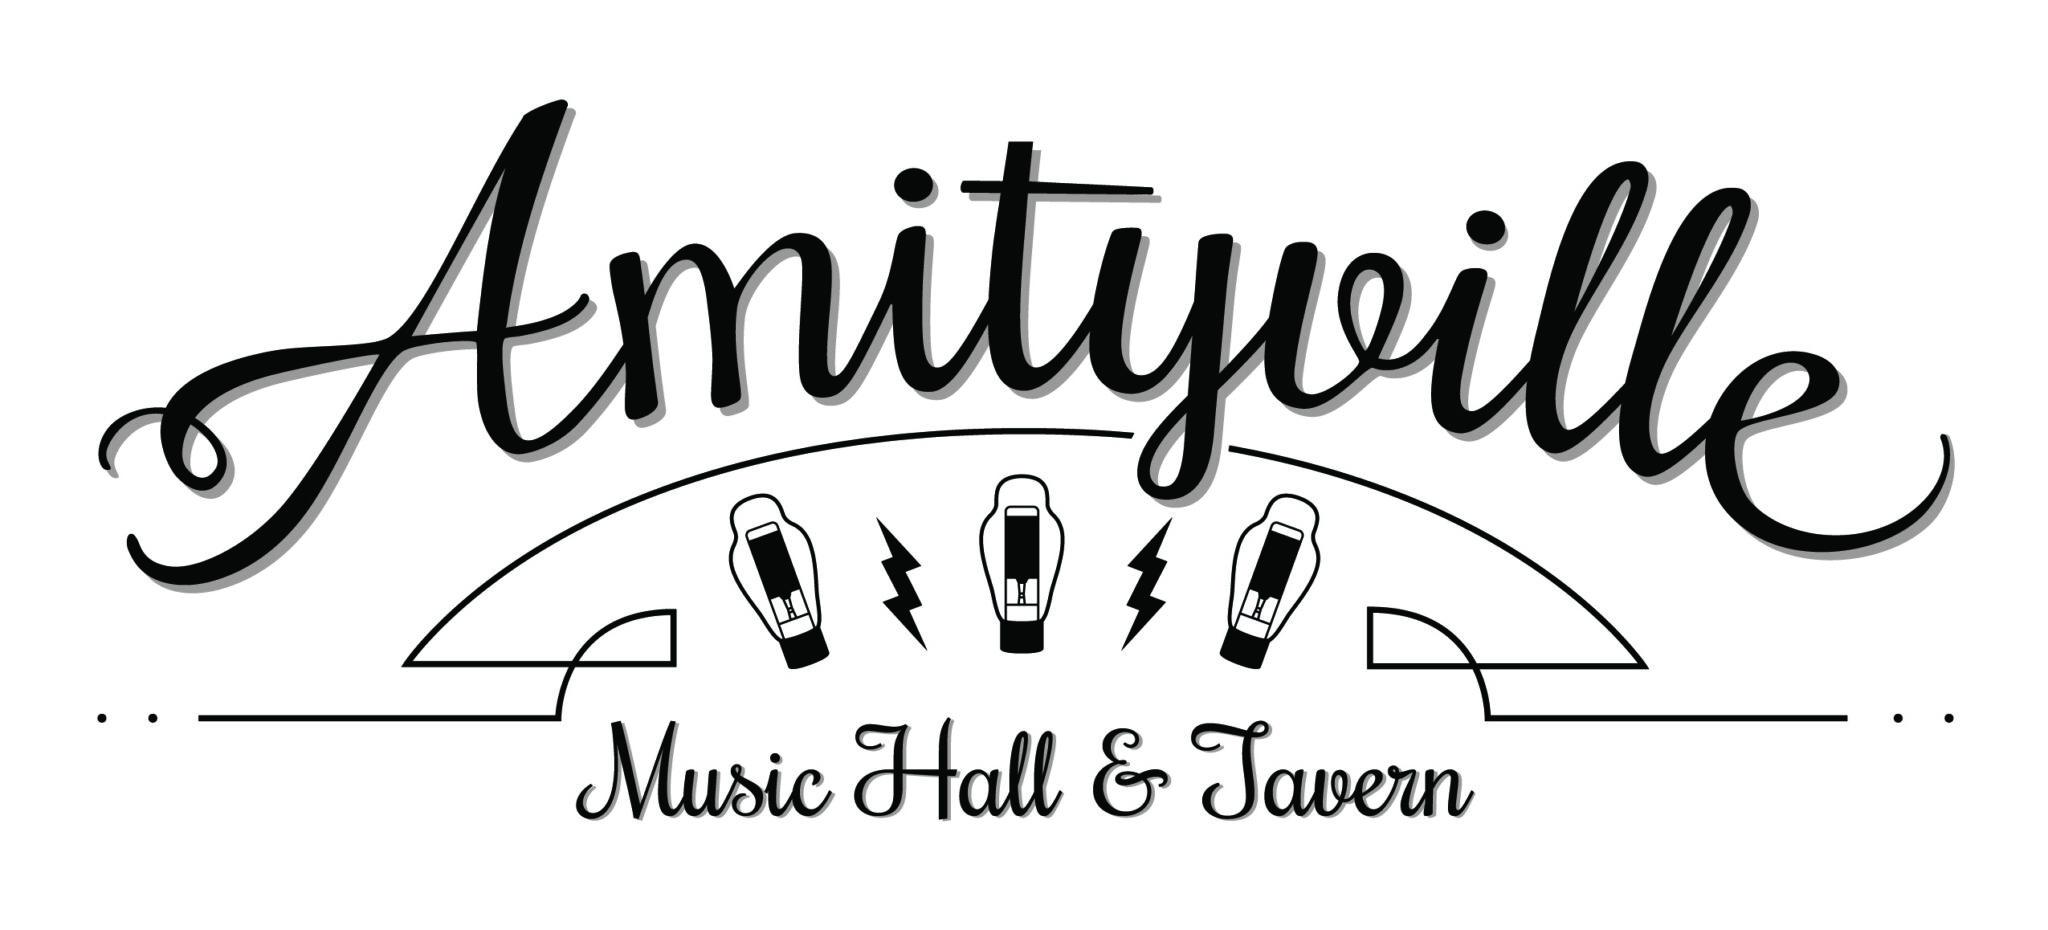 Long Island Saves Amityville Music Hall